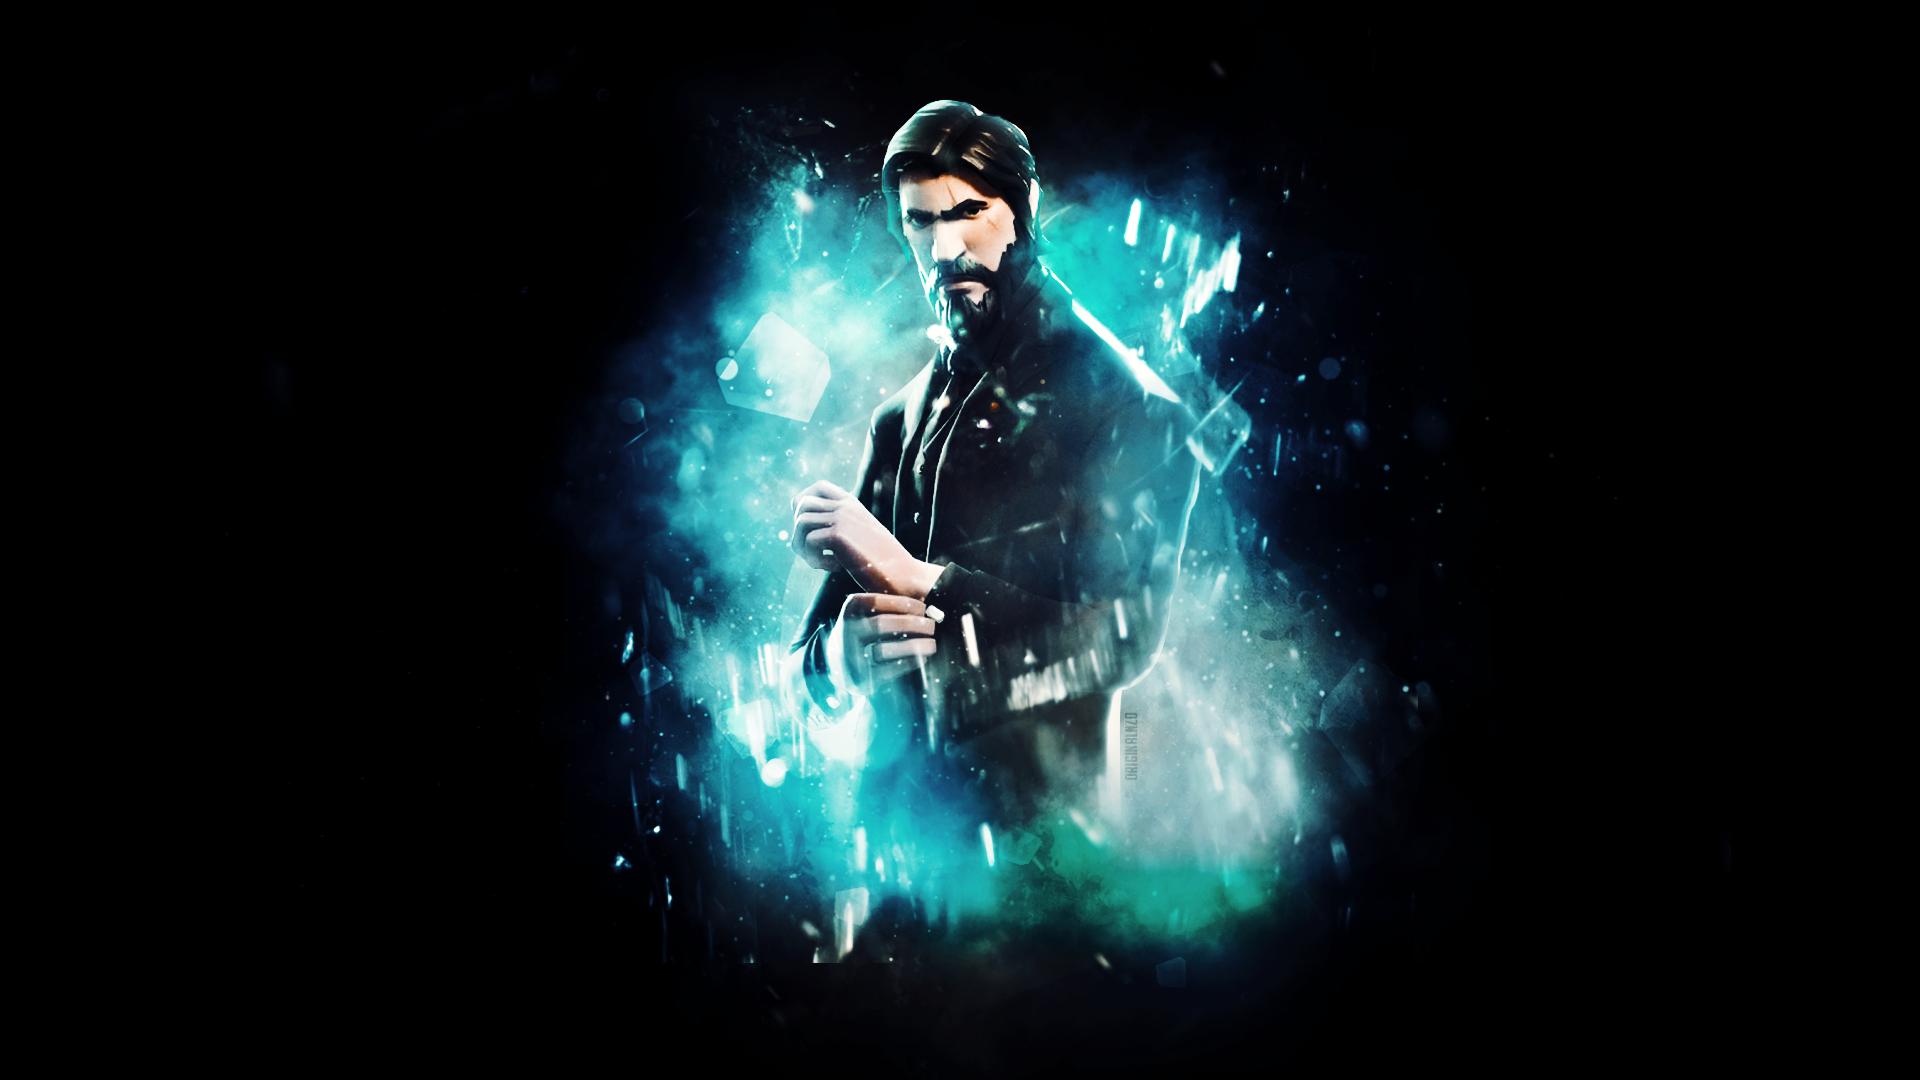 Fortnite 1080px Fortnite Live Wallpapers Epic Games Fortnite